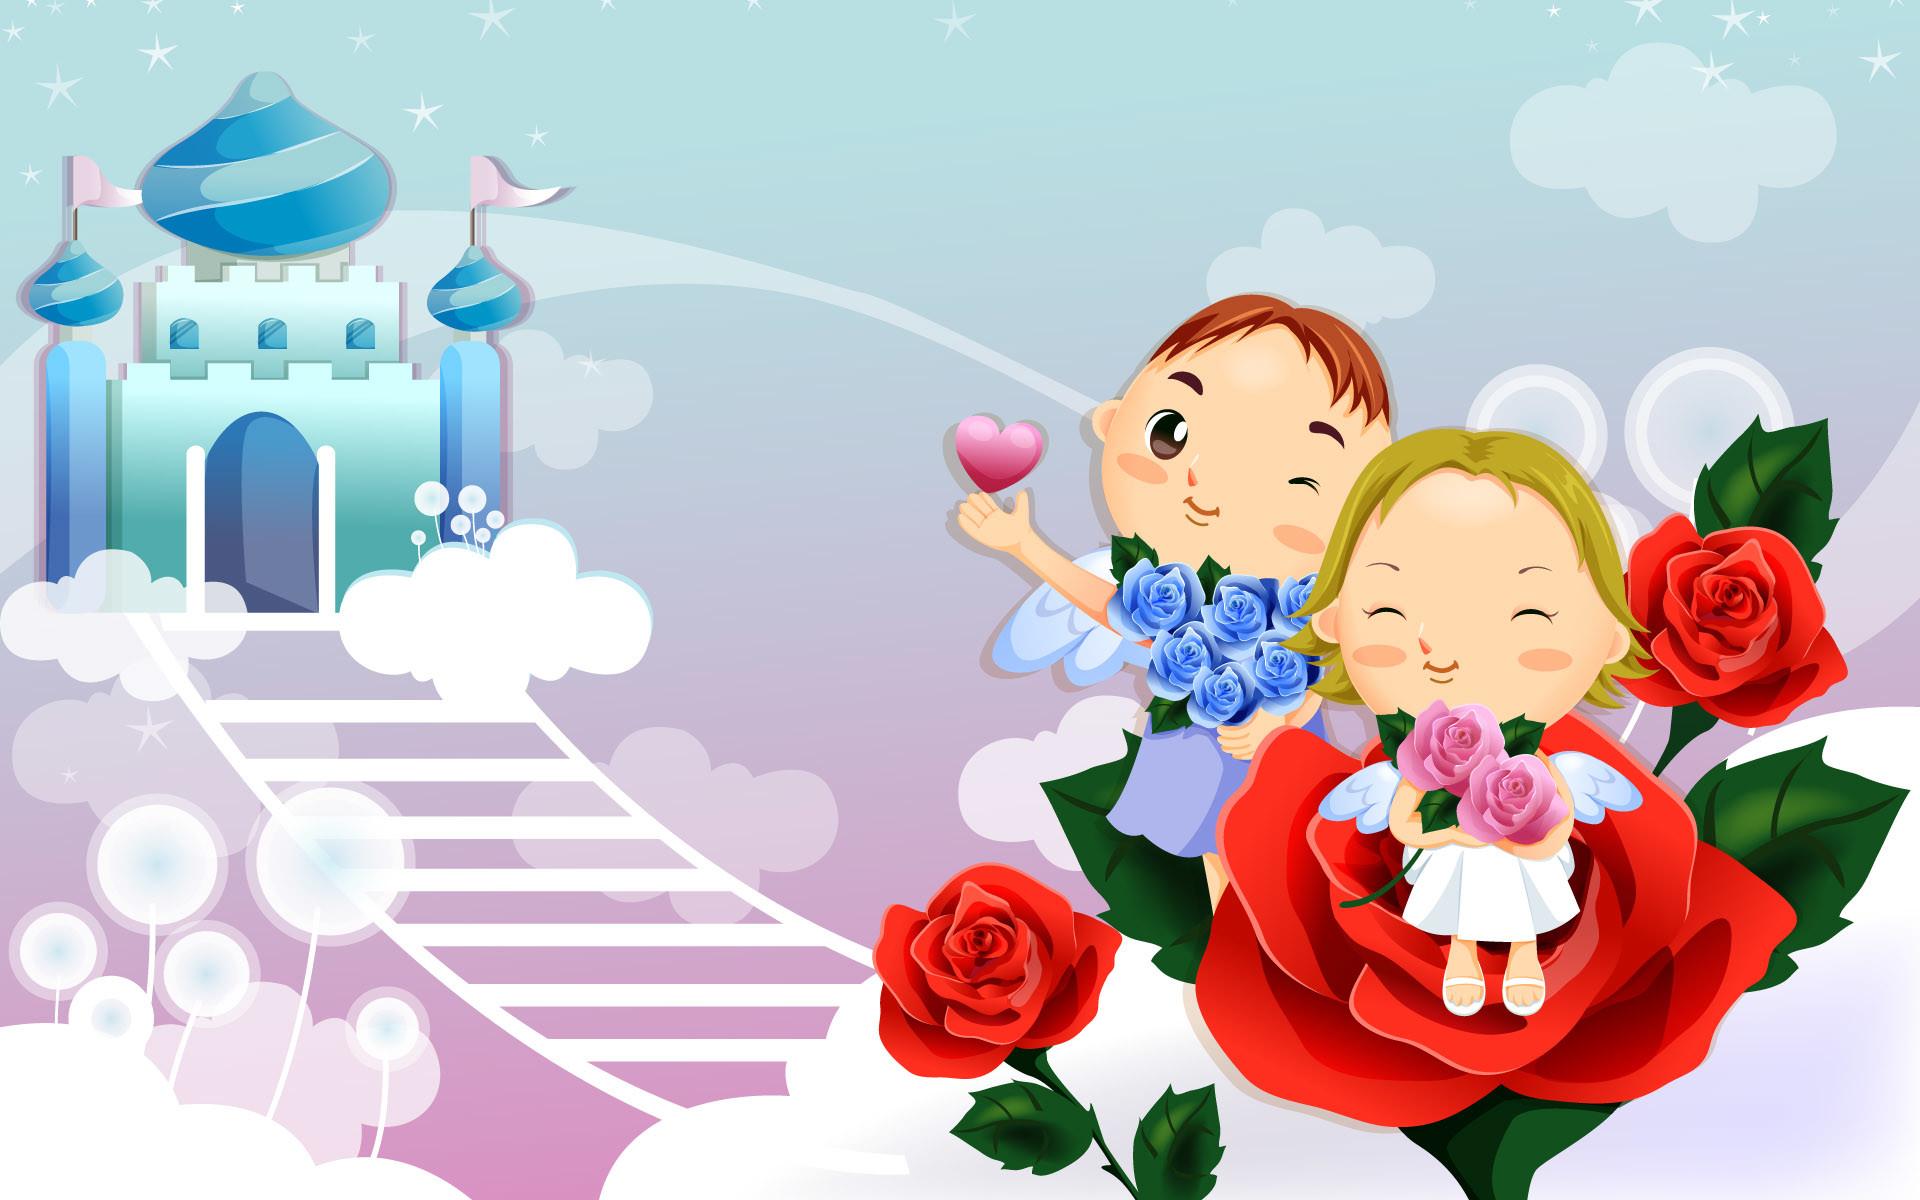 cute cartoons wallpapers for boys Cartoons Pinterest Cartoon